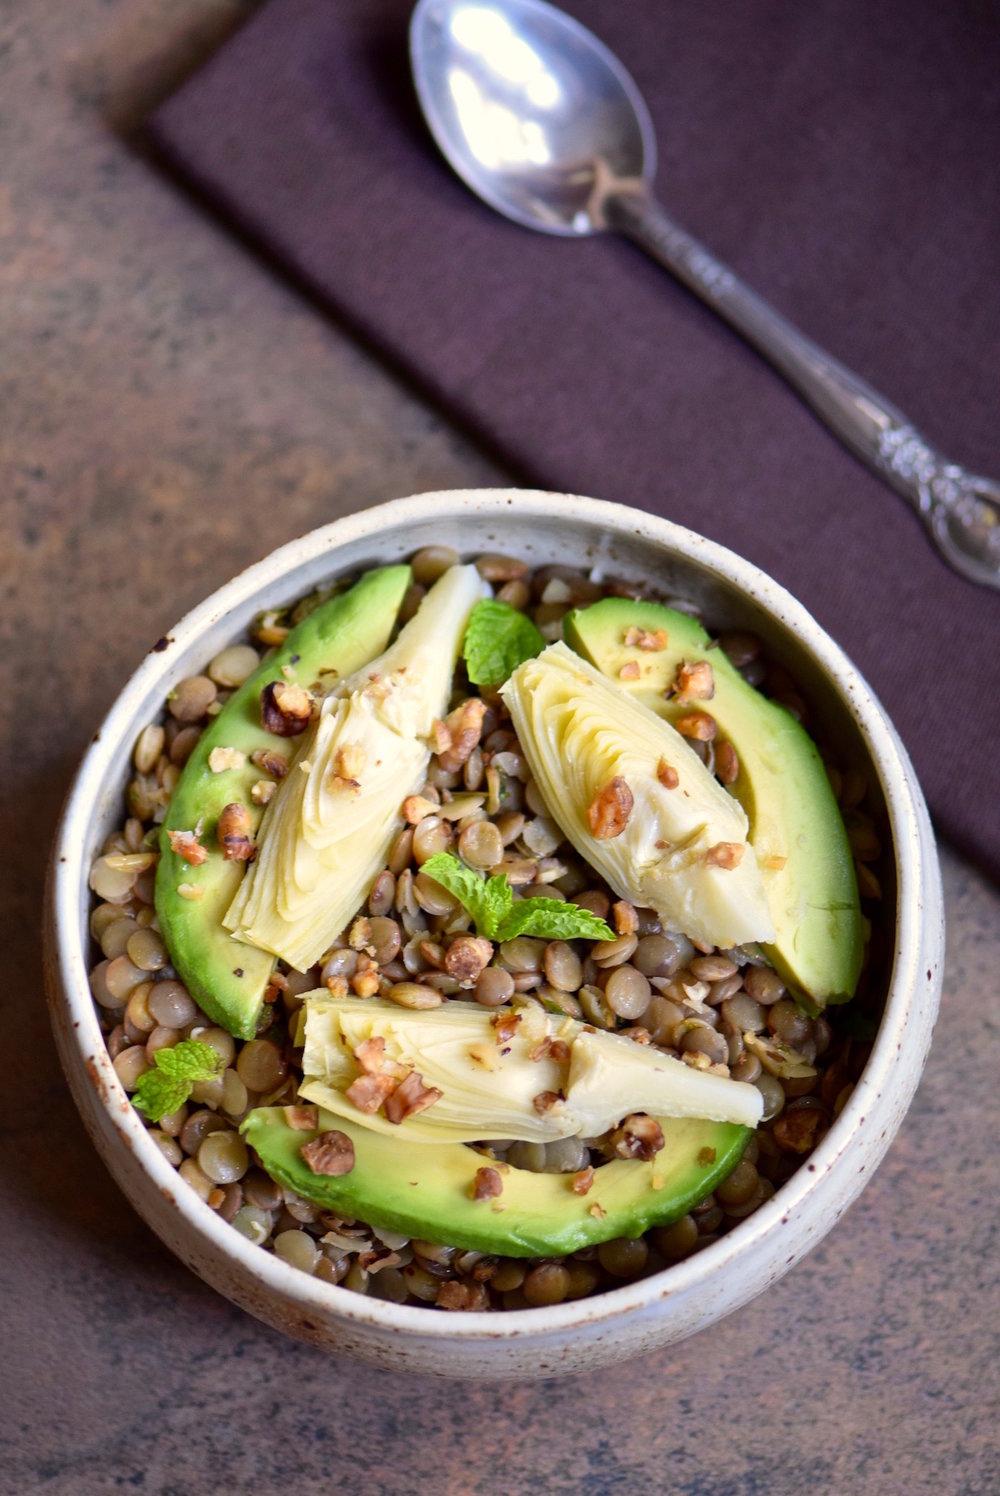 Avocado Artichoke Lentil Salad - gluten free, dairy free and vegan | TastingPage.com